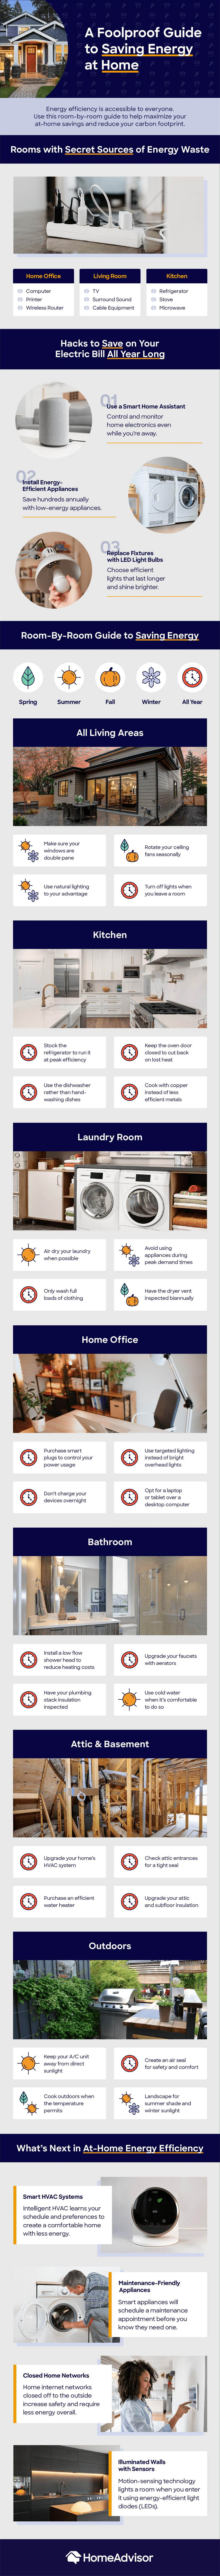 Saving energy at home infographic